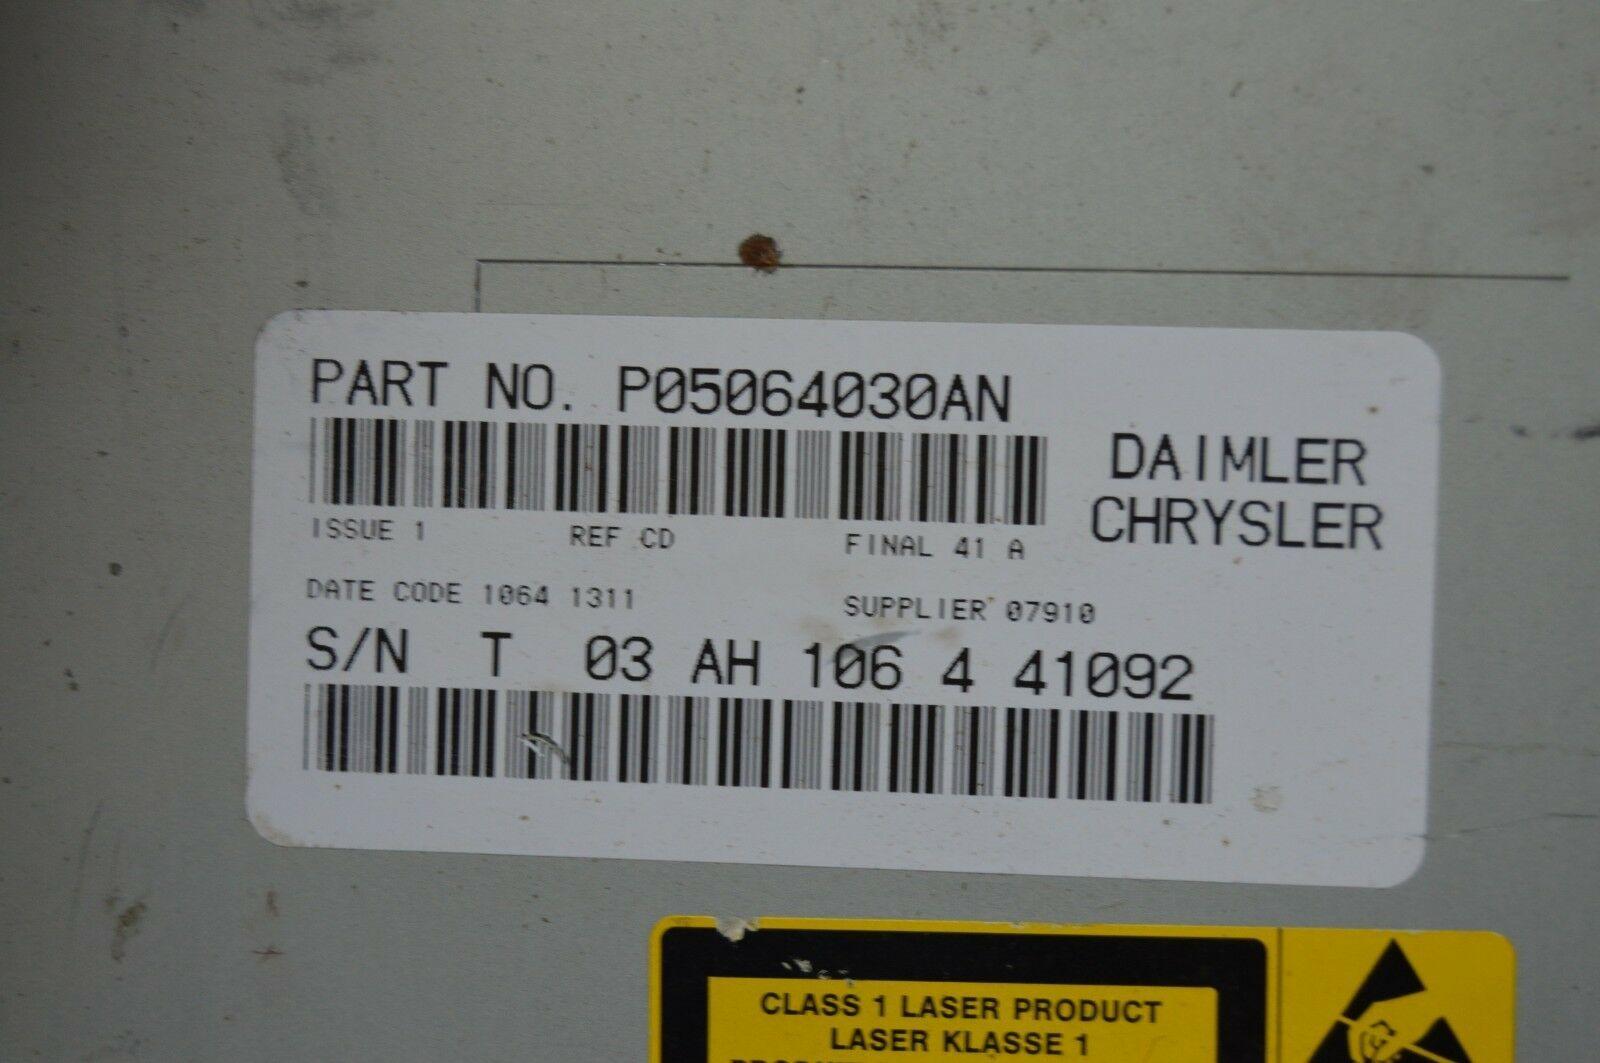 2005-2010 CHRYSLER 300 RADIO CD PLAYER OEM RADIO P05064030AN TESTED H61#030 image 6